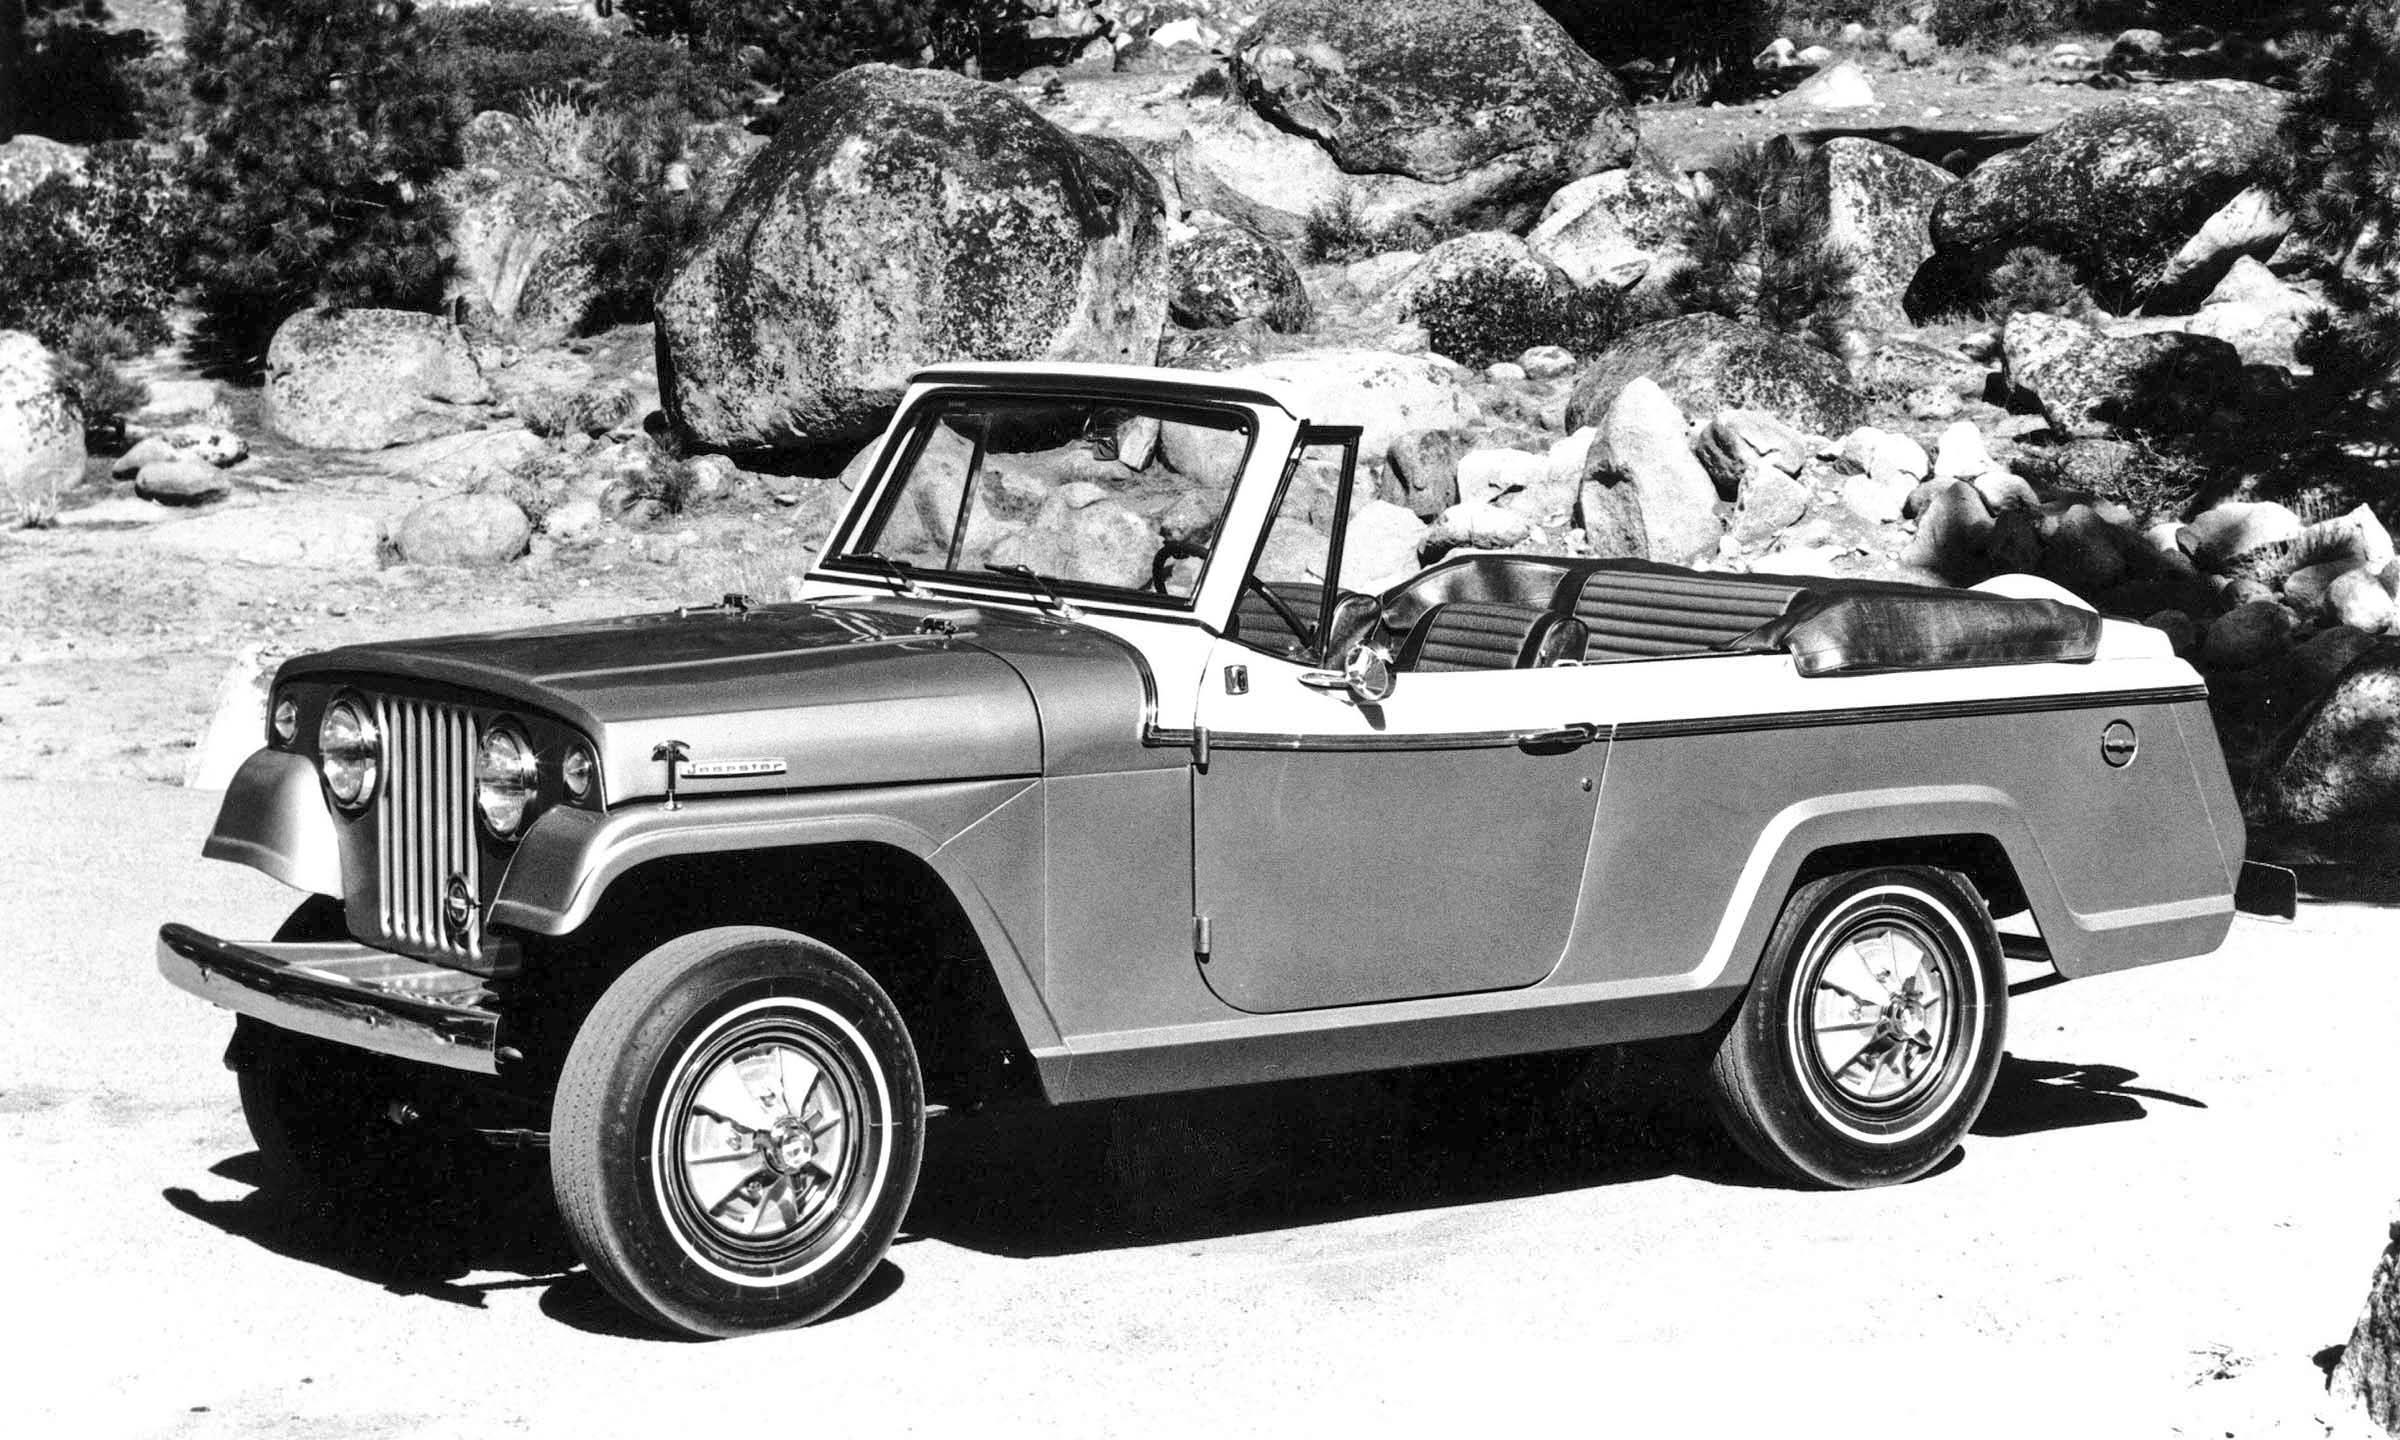 Jeep A Brief History Autonxt 1967 Jeepster Commando Wiring Diagram Fca Us Llc 19671973